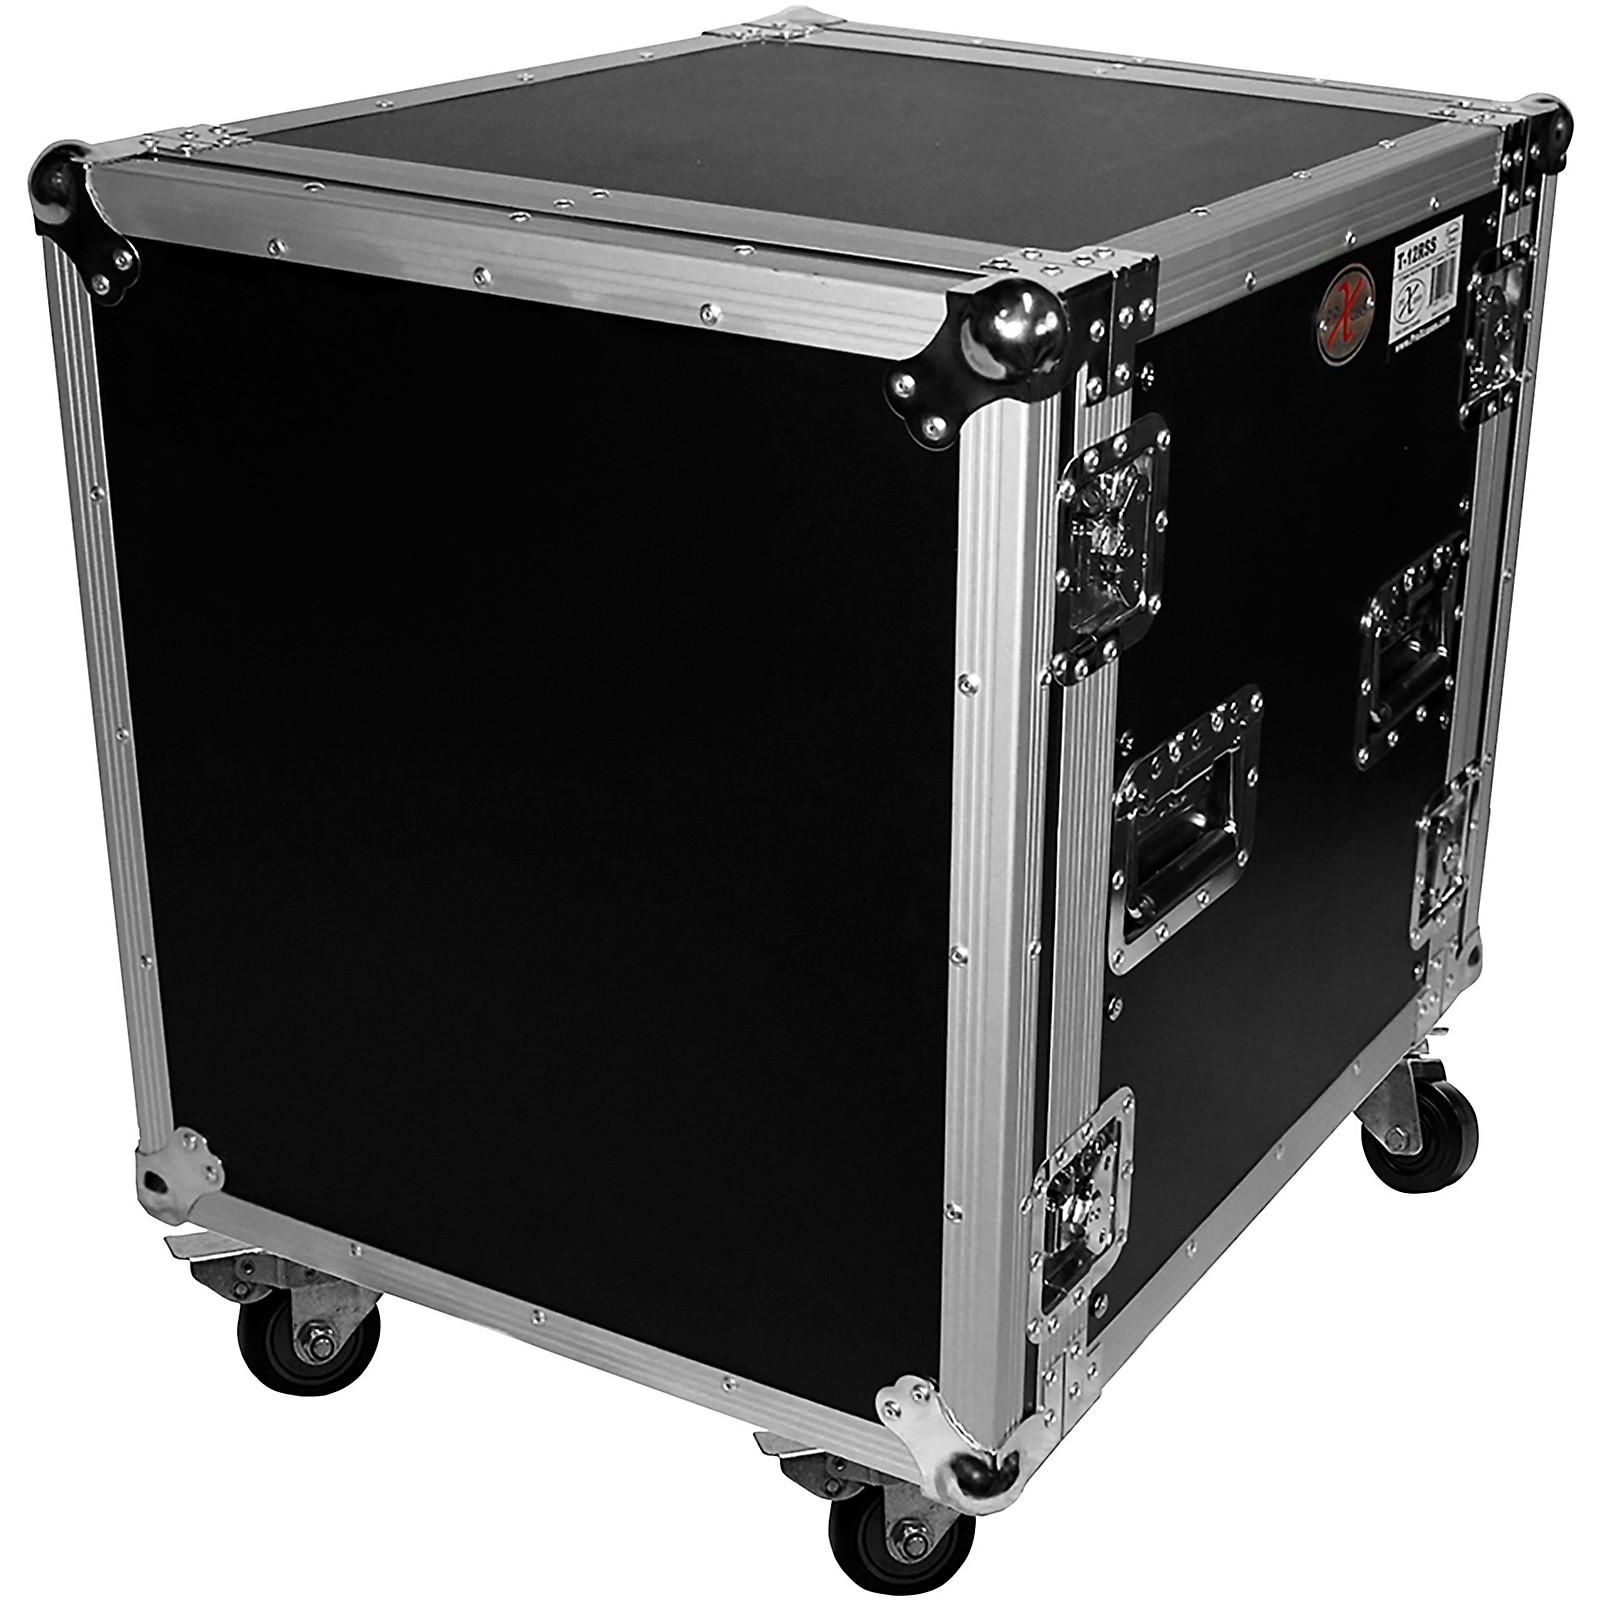 ProX 12U Space Amp Rack Mount ATA Flight Case 19